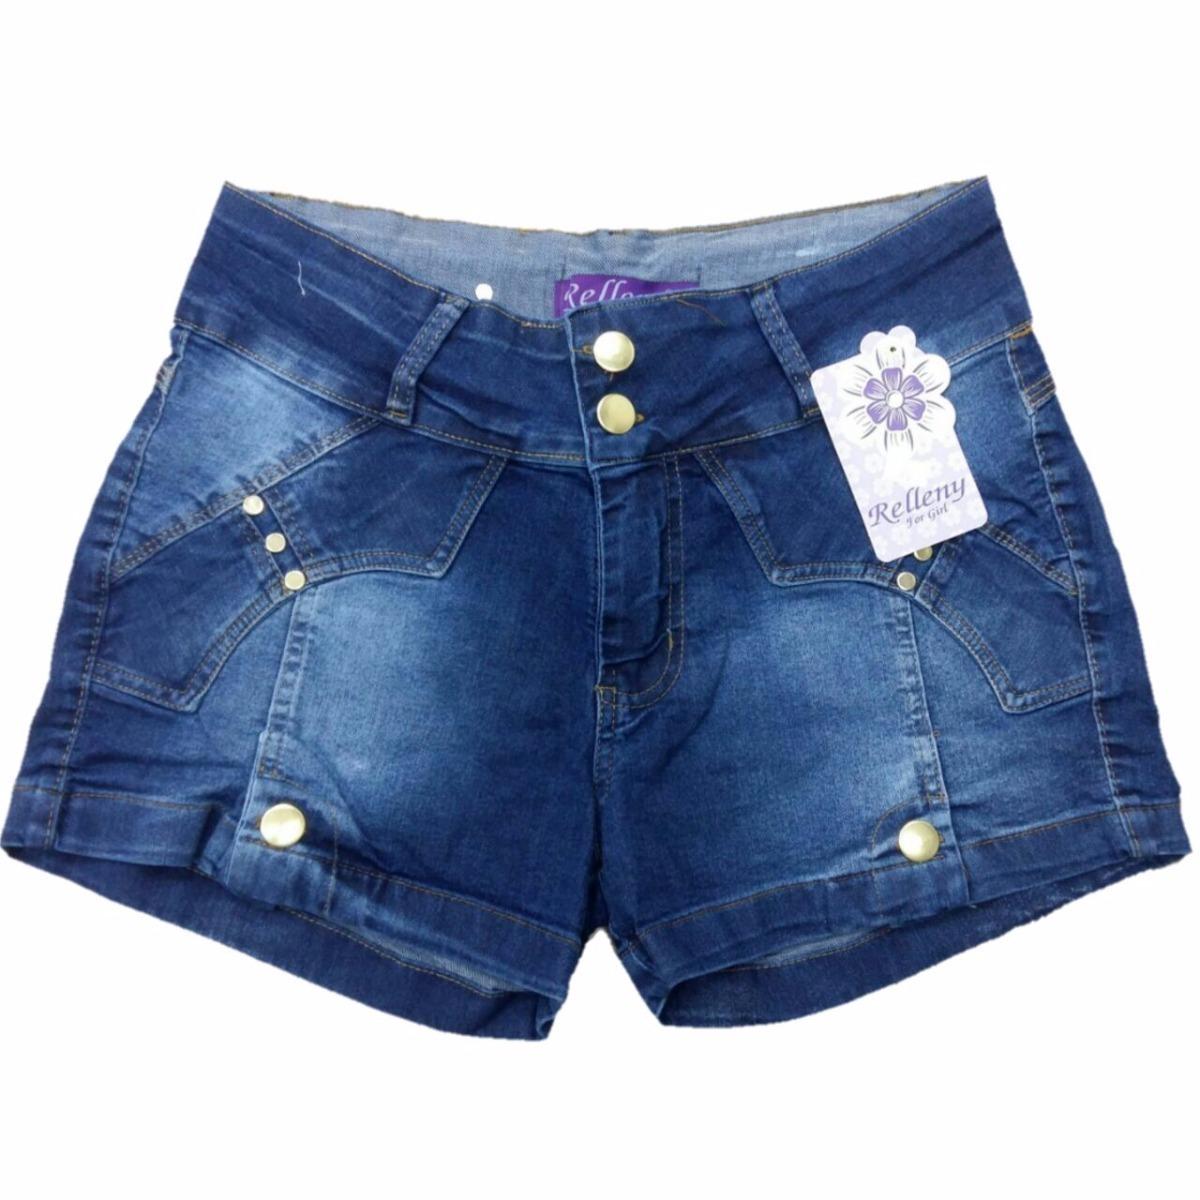 2cb48360f Carregando zoom... jeans feminino short 2 kit c/3 short bermuda jeans plus  size feminino até 56 lycra